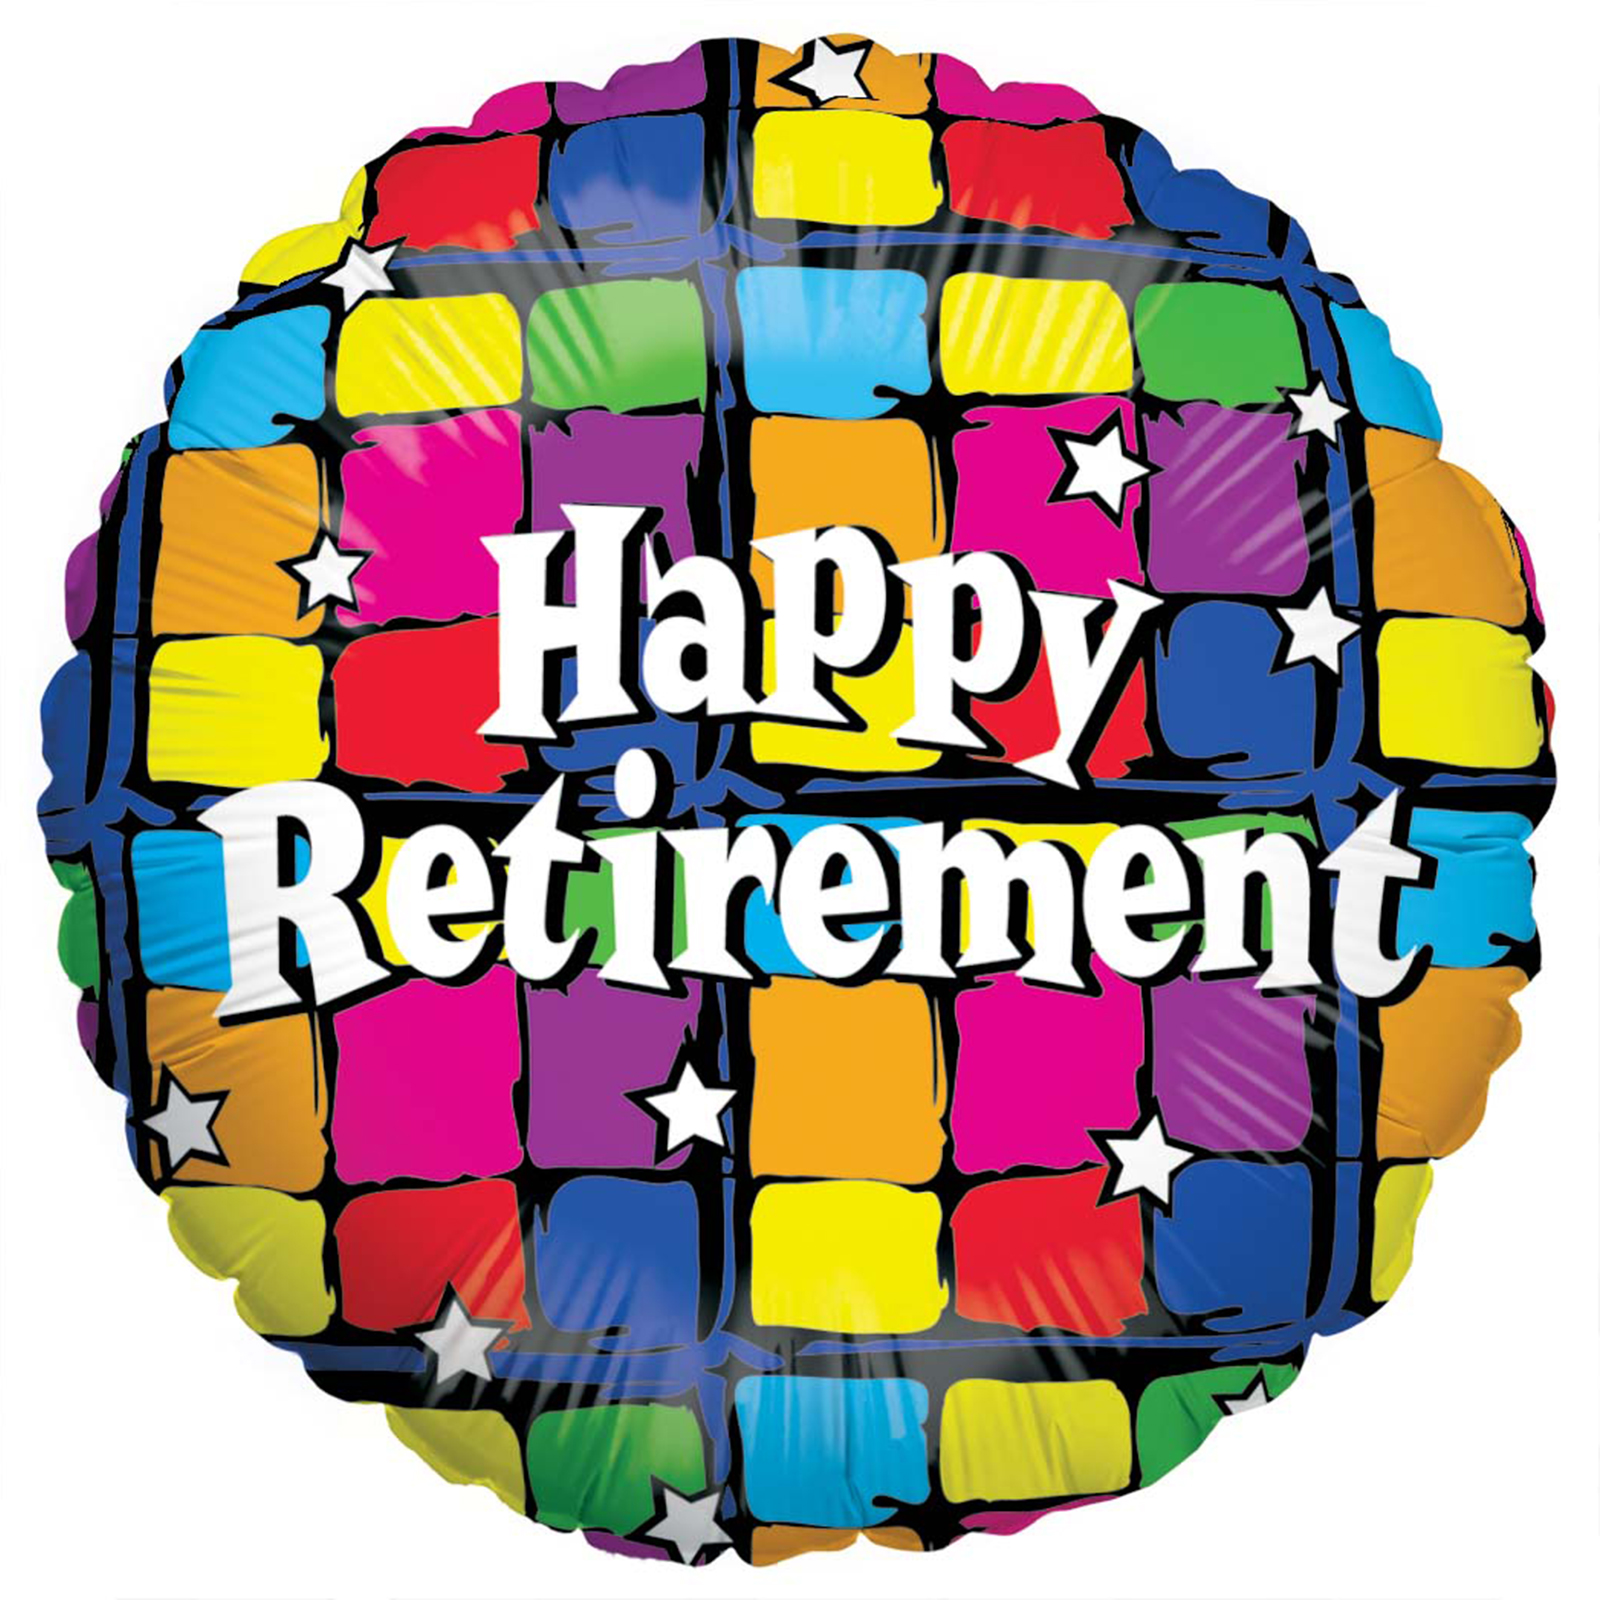 Free Retirement Clip Art, Download Free Clip Art, Free Clip.